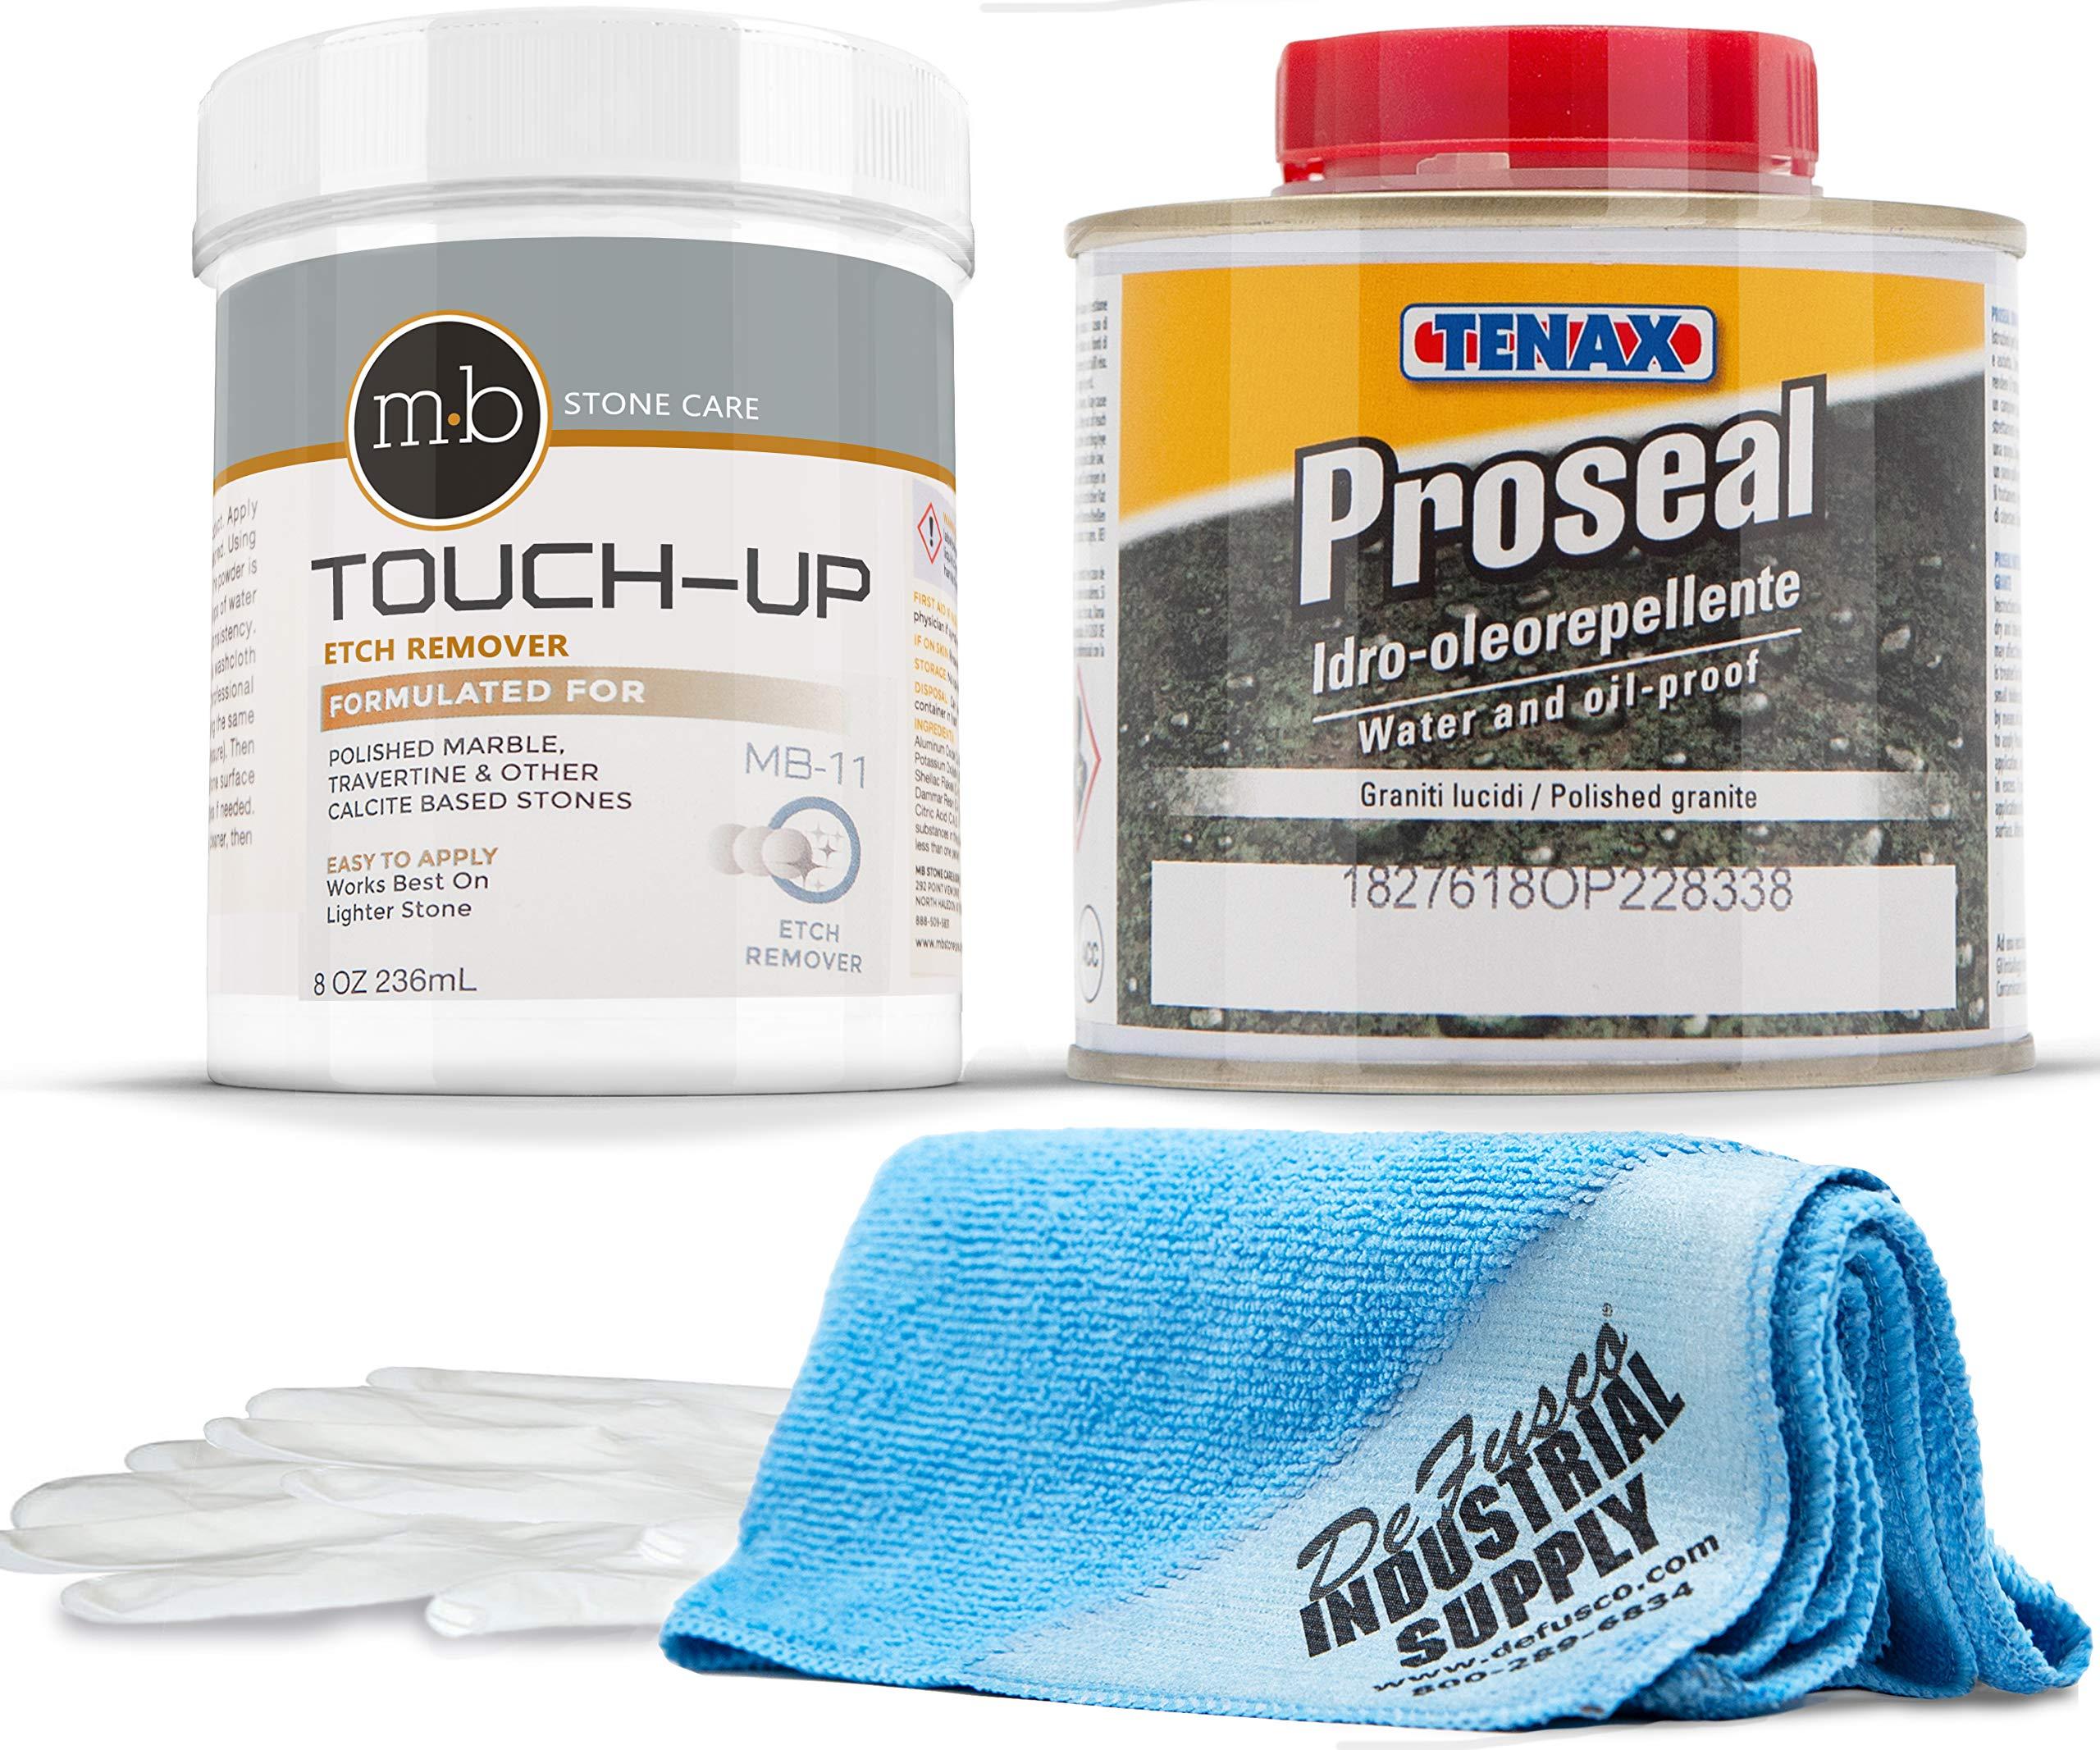 Marble Polish Powder - MB-11 oz Marble Polishing Powder- Tenax Proseal 250 mL -16x16 Microfiber Cloth - Gloves - BUNDLE - 4 Items